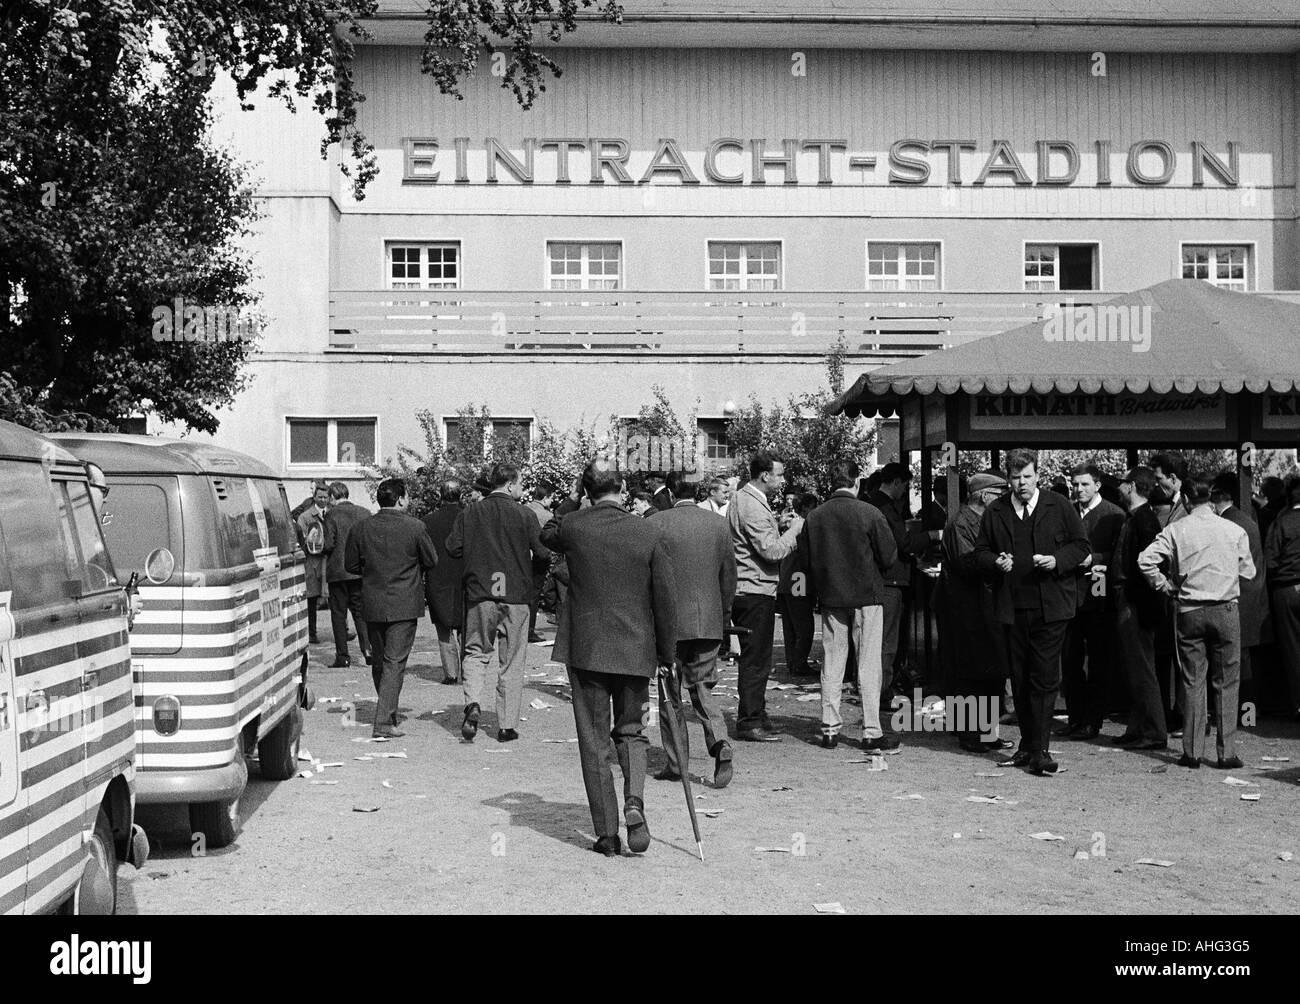 football, Bundesliga, 1966/1967, Stadium at the Hamburger Strasse, Eintracht Brunswick versus Borussia Moenchengladbach 2:1, spectators walking to the stadium - Stock Image